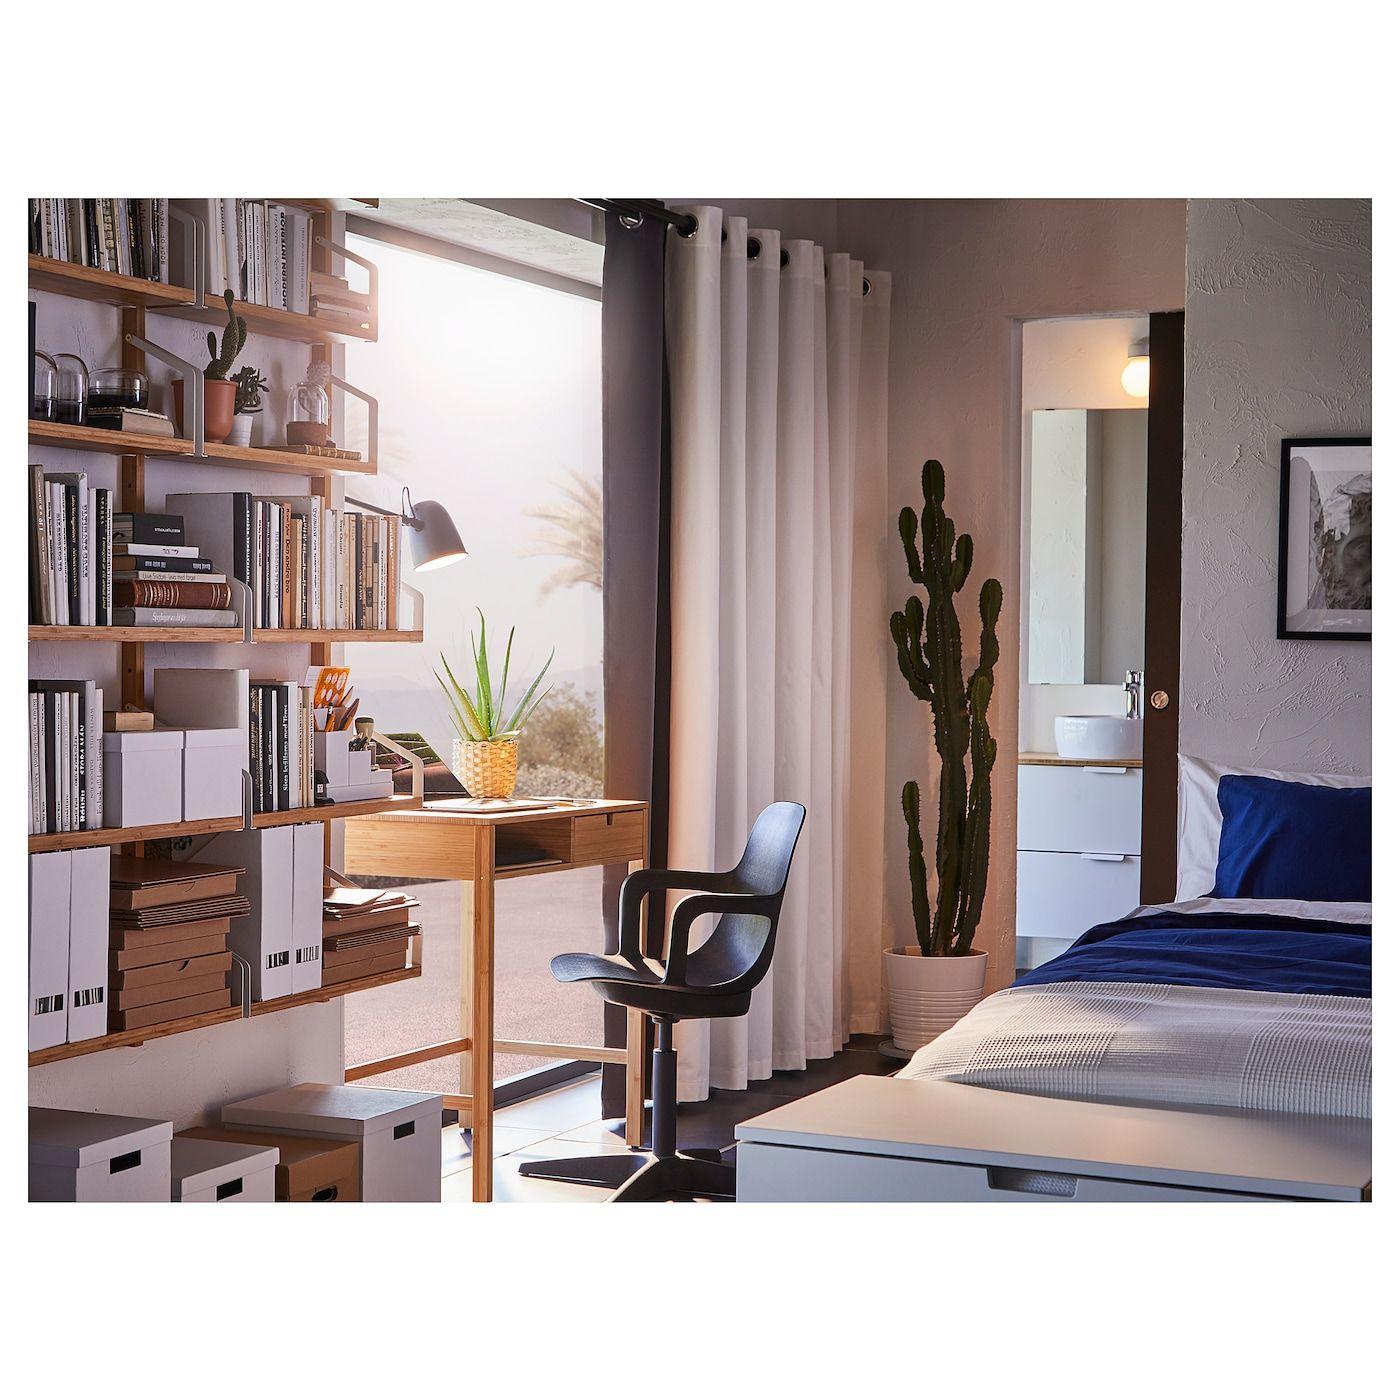 IKEA NORDKISA Bamboo Dressing table Ikea bedroom